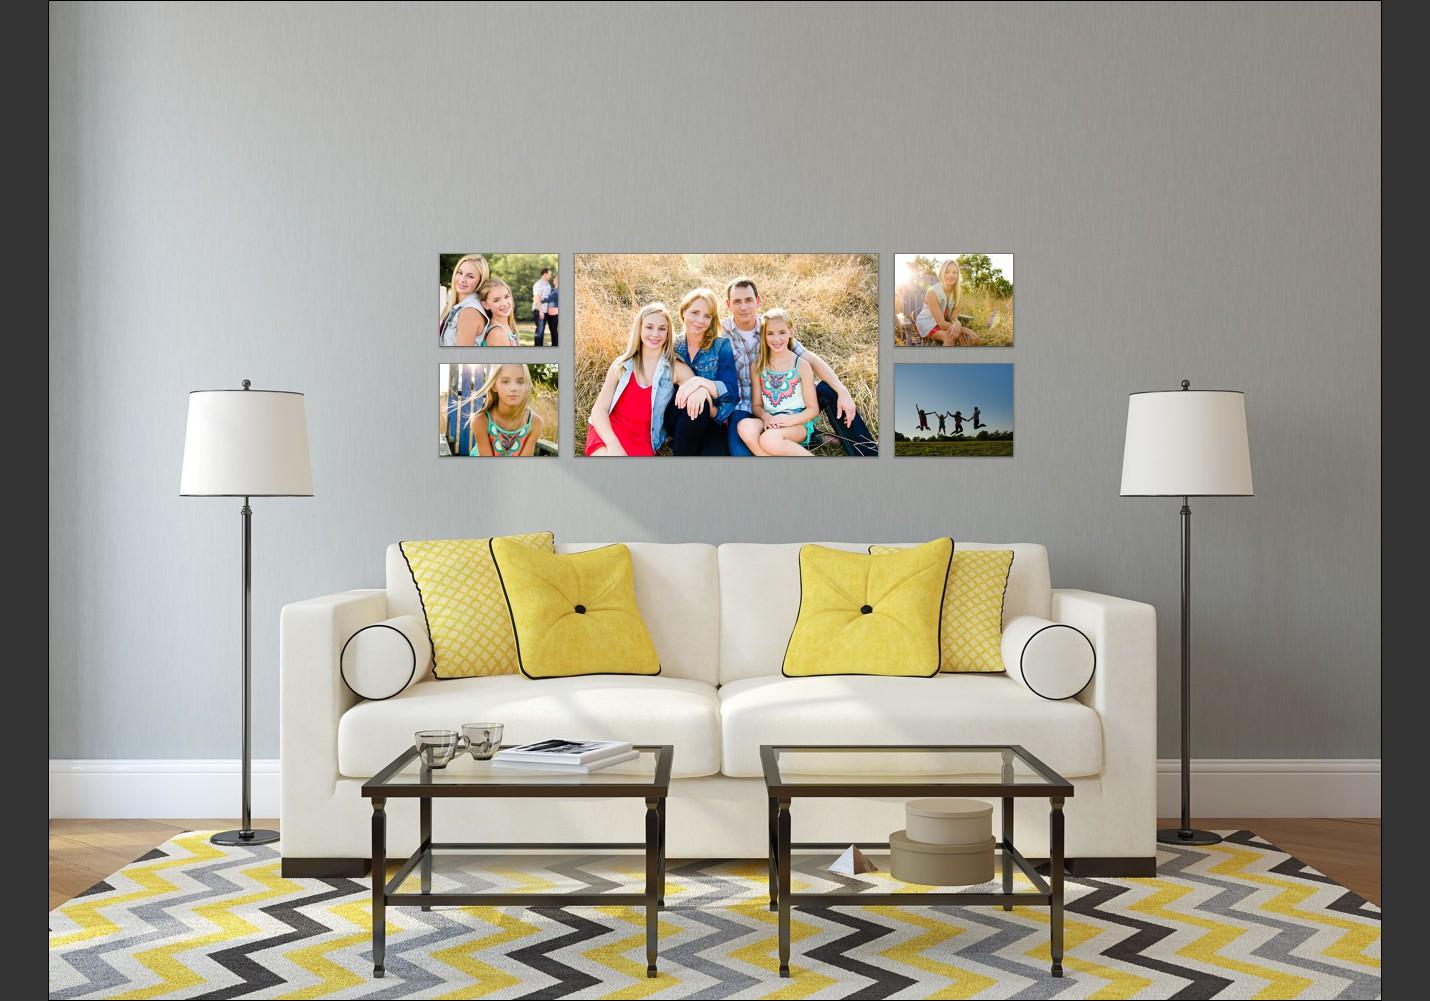 atlanta-family-portrait.jpg